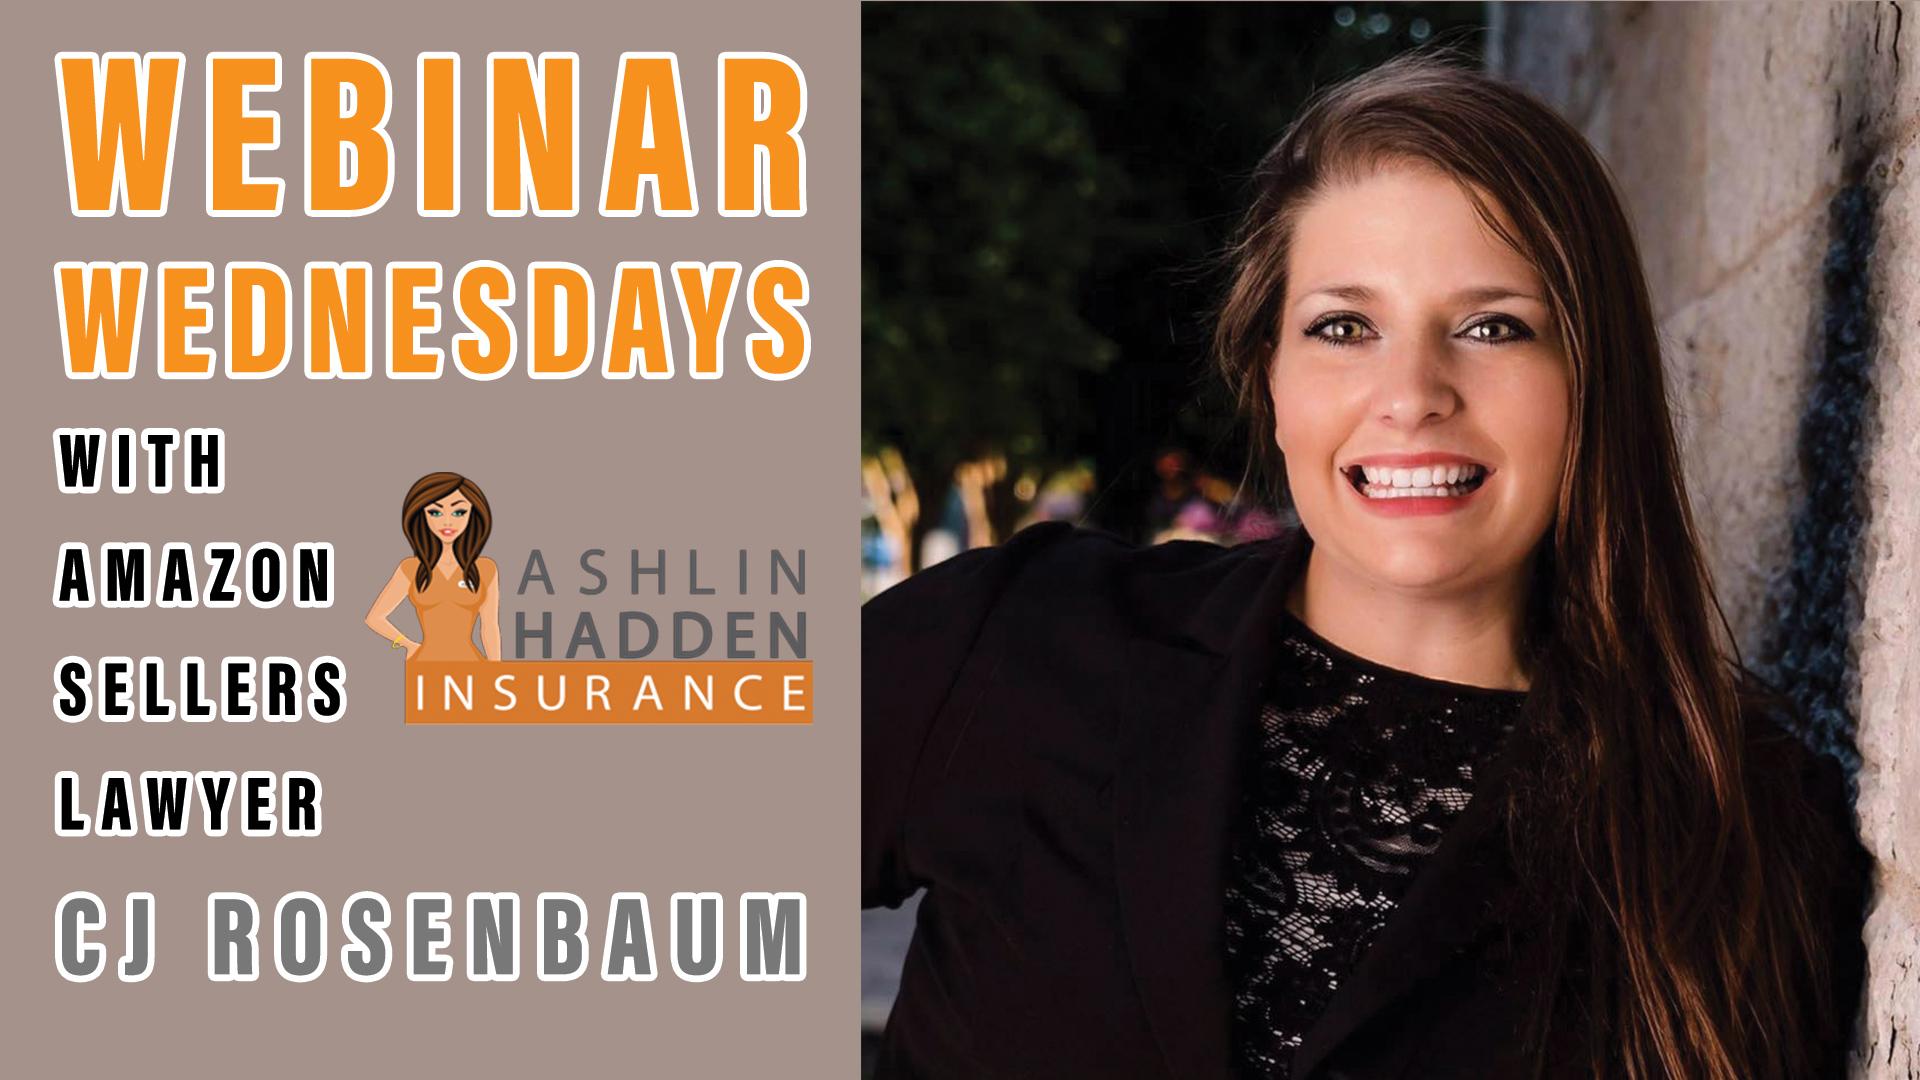 Ashlin Hadden Insurance for Amazon Sellers